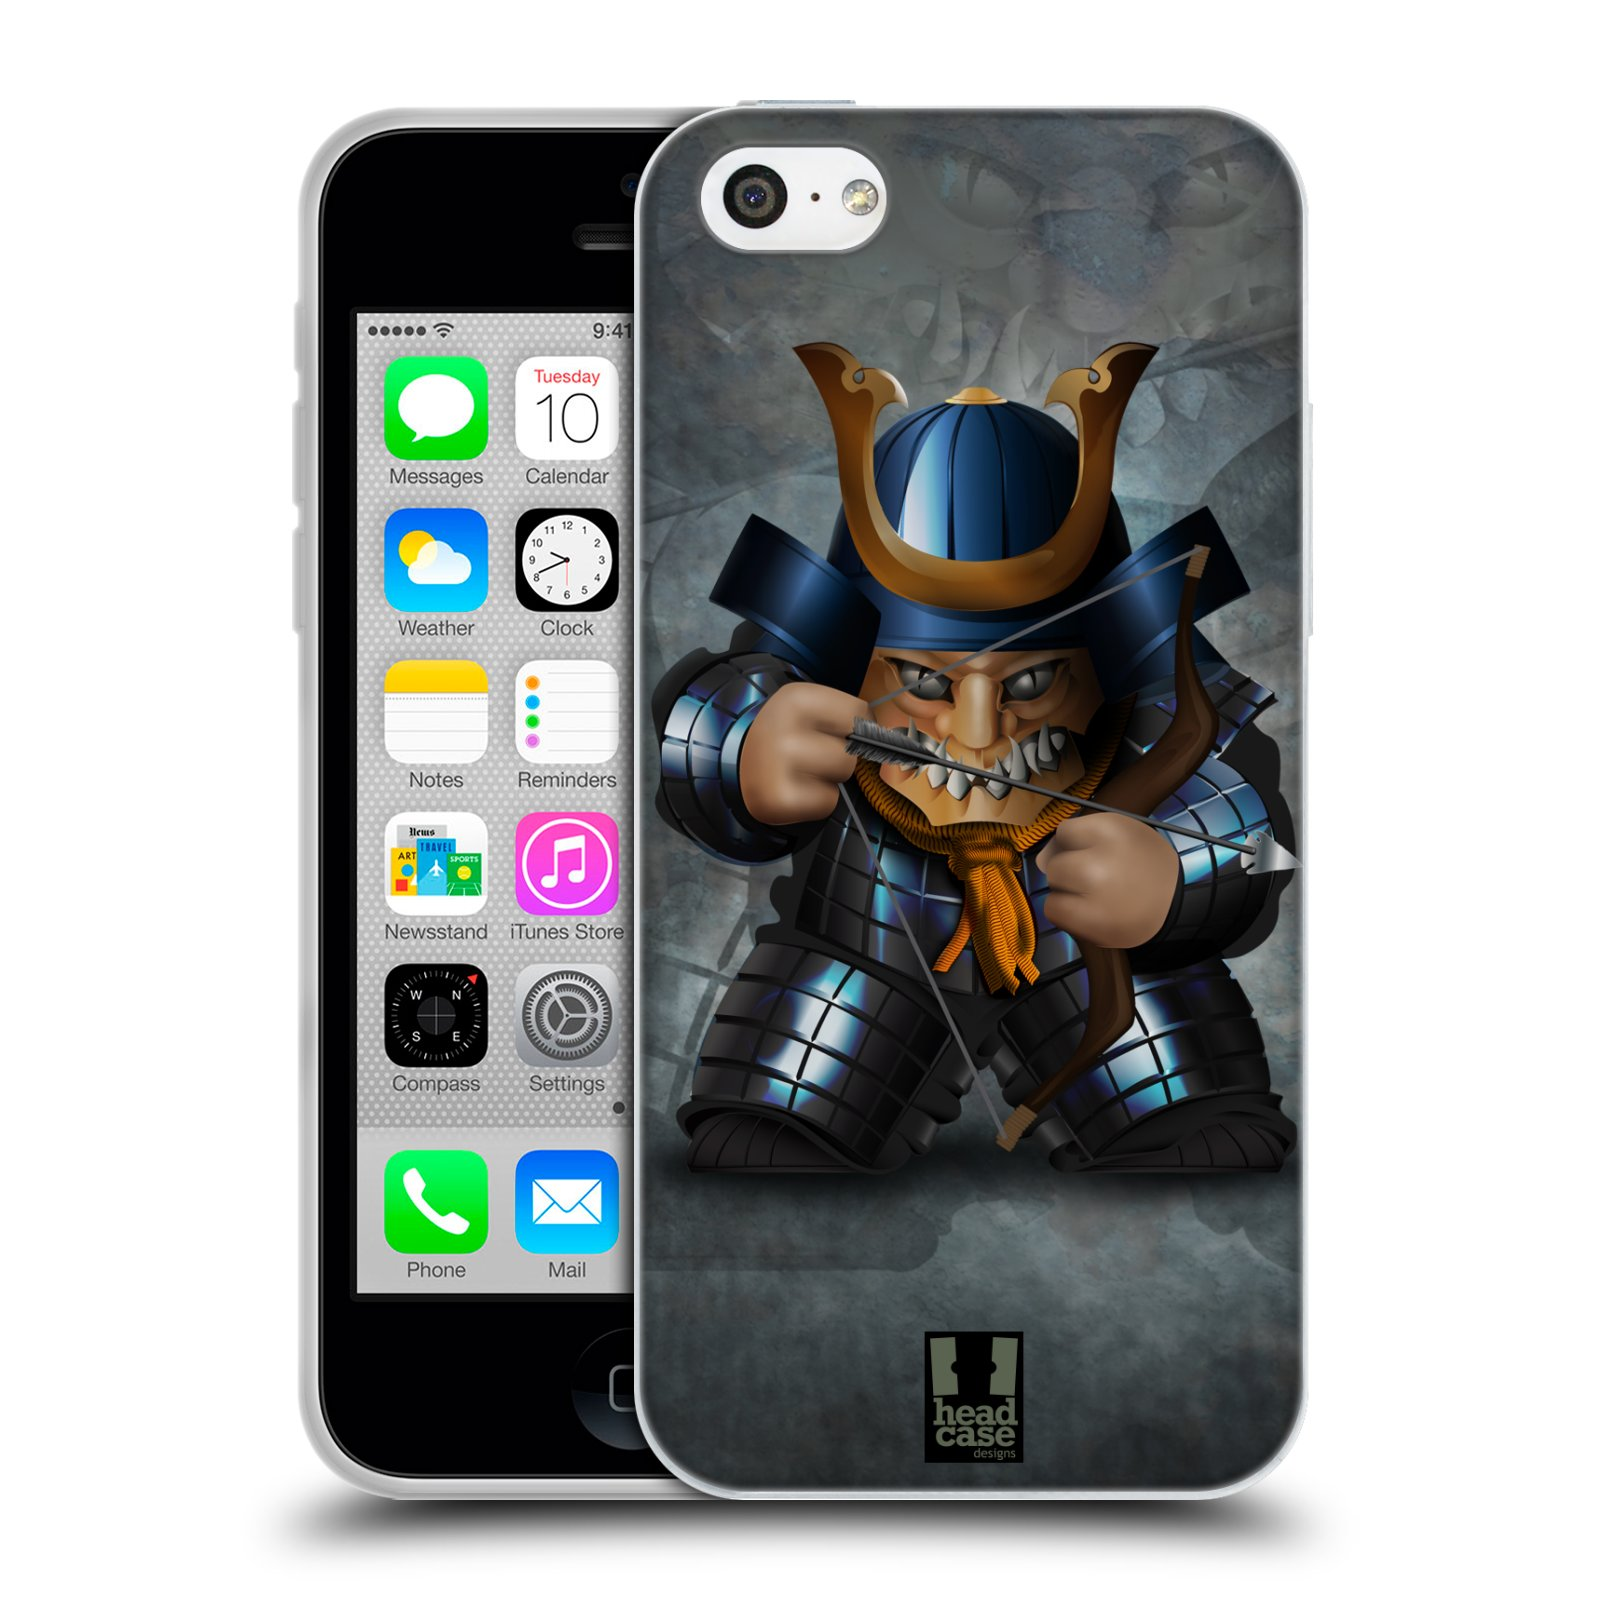 HEAD CASE silikonový obal na mobil Apple Iphone 5C vzor Malí bojovníci SHOGUN STŘELEC